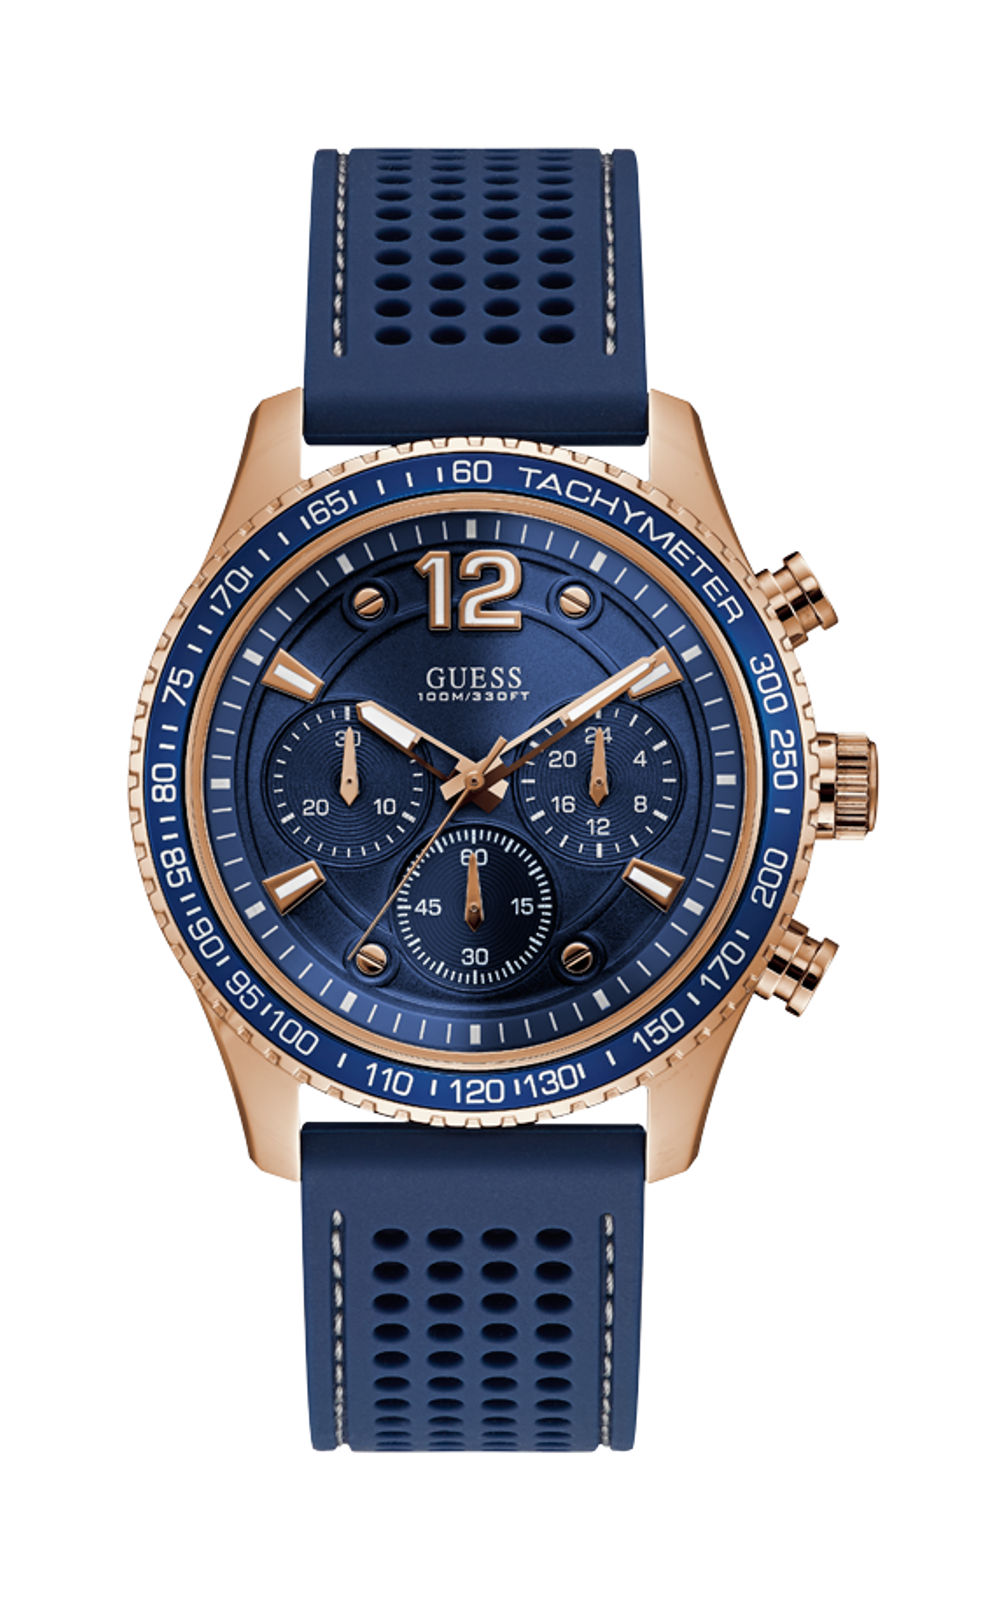 GUESS W0971G3 Ανδρικό Ρολόι Quartz Χρονογράφος Ακριβείας 5a165cd4250